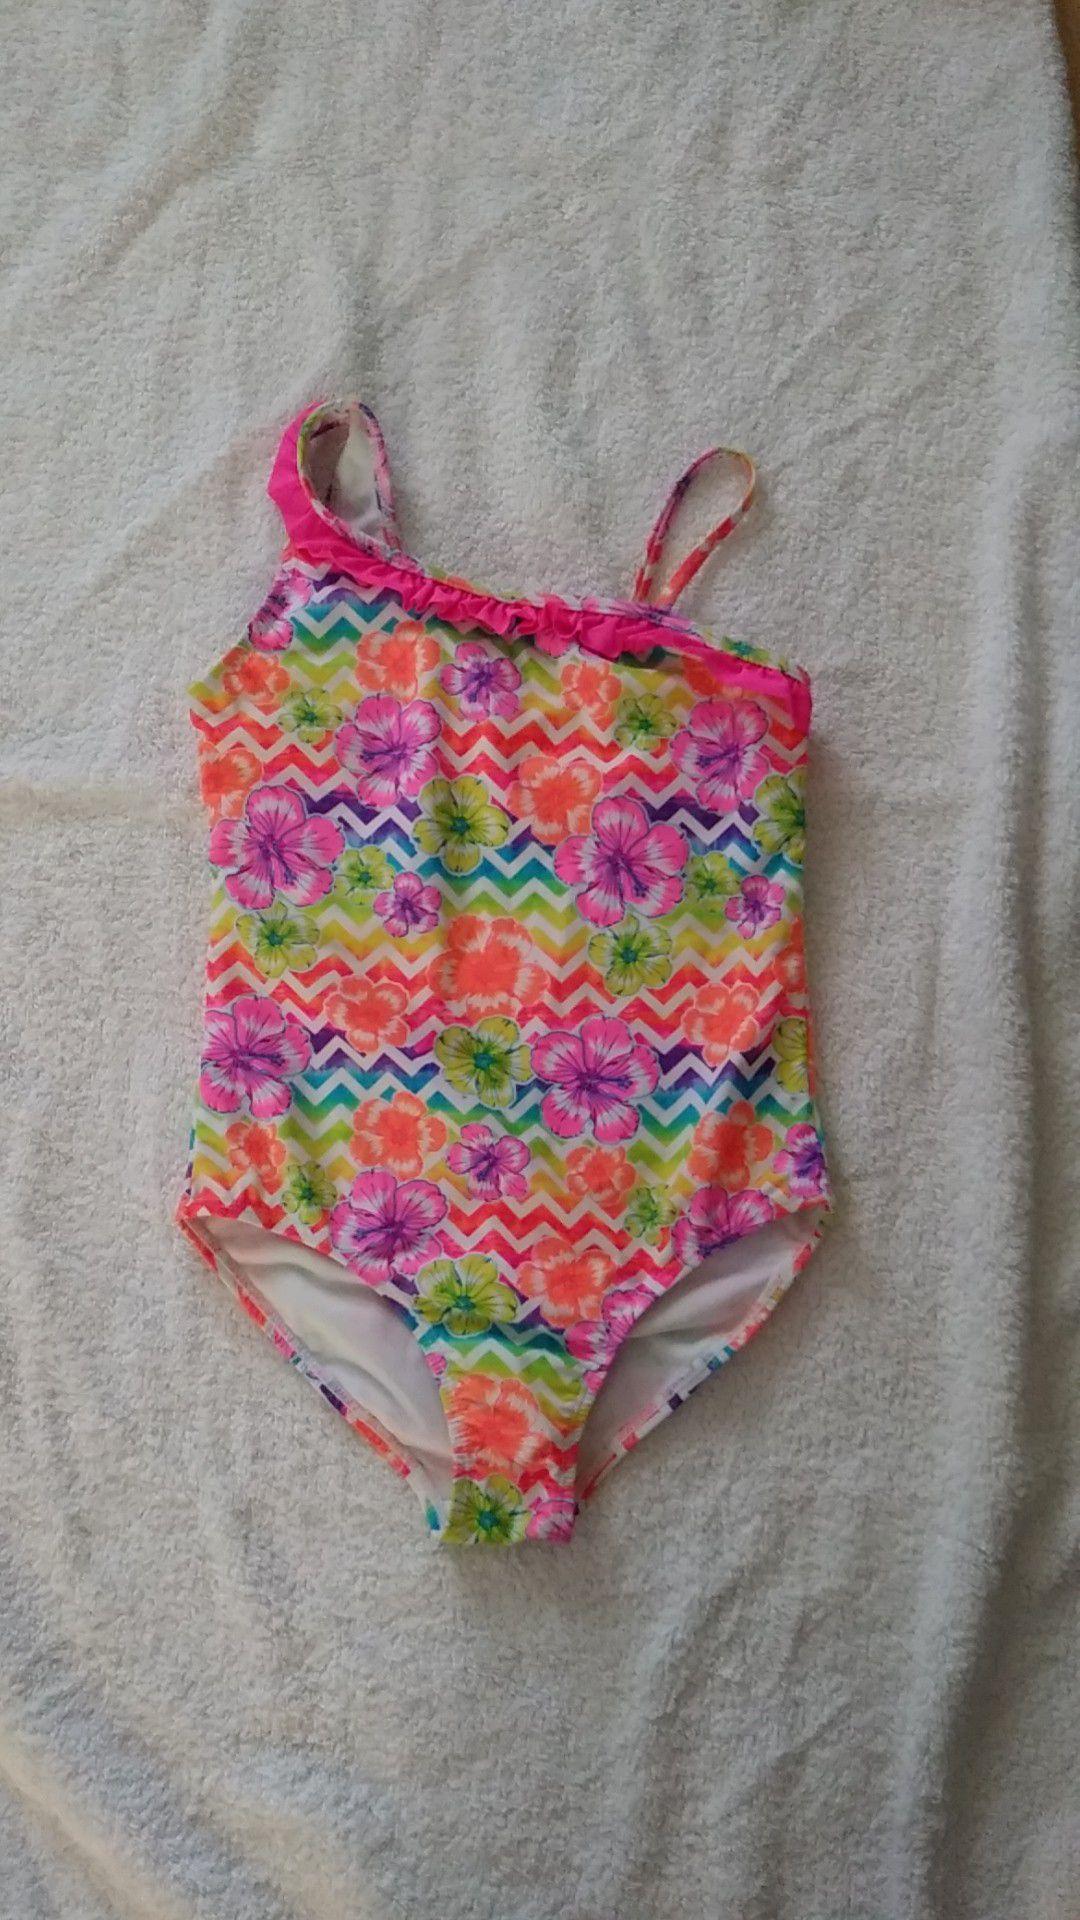 Girls Size 7-8 swimsuit